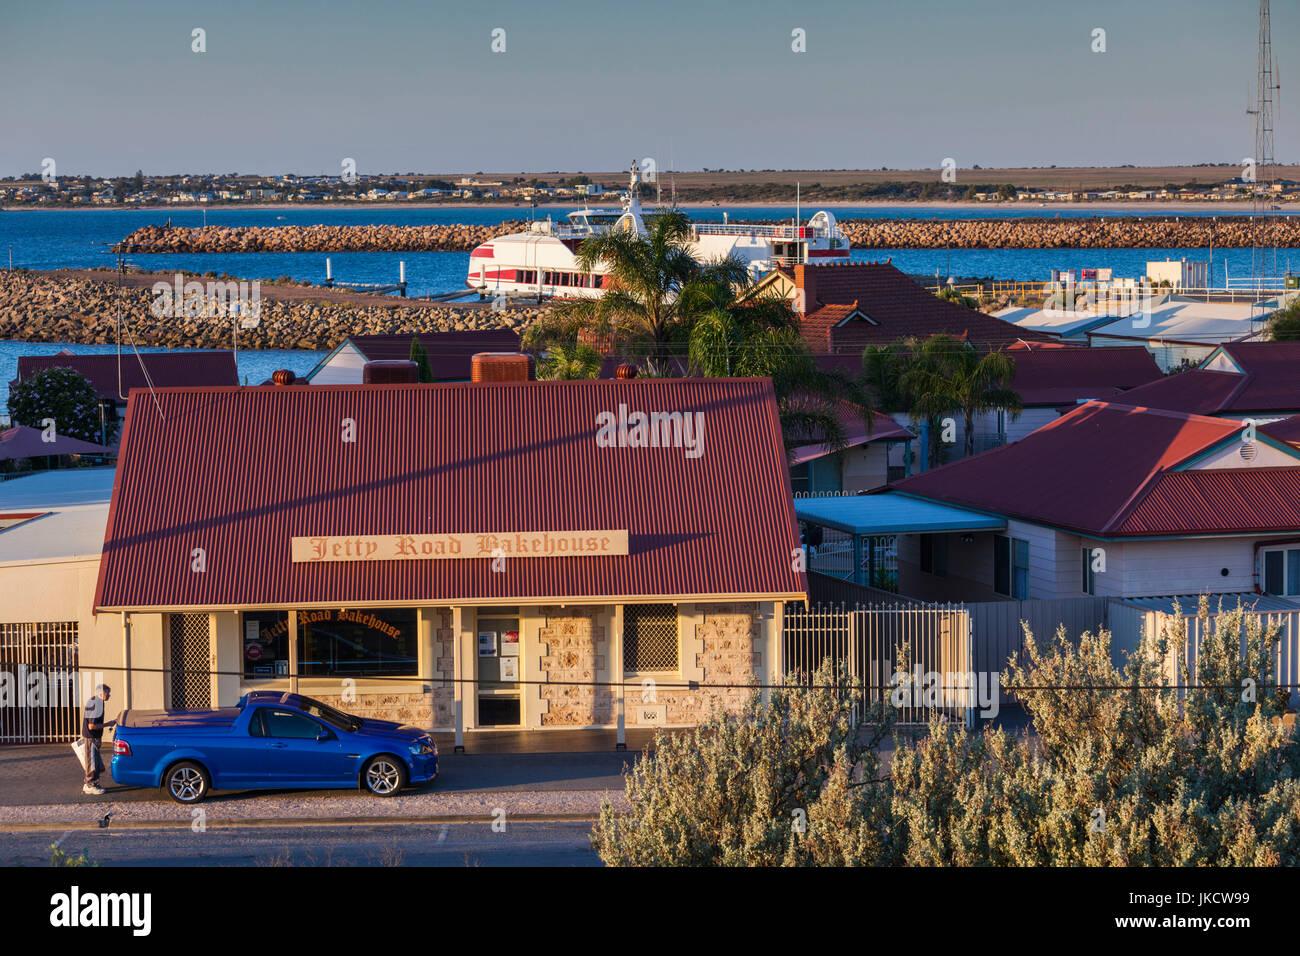 Australia, South Australia, Yorke Peninsula, Wallaroo, Jetty Road Bakehouse and port - Stock Image